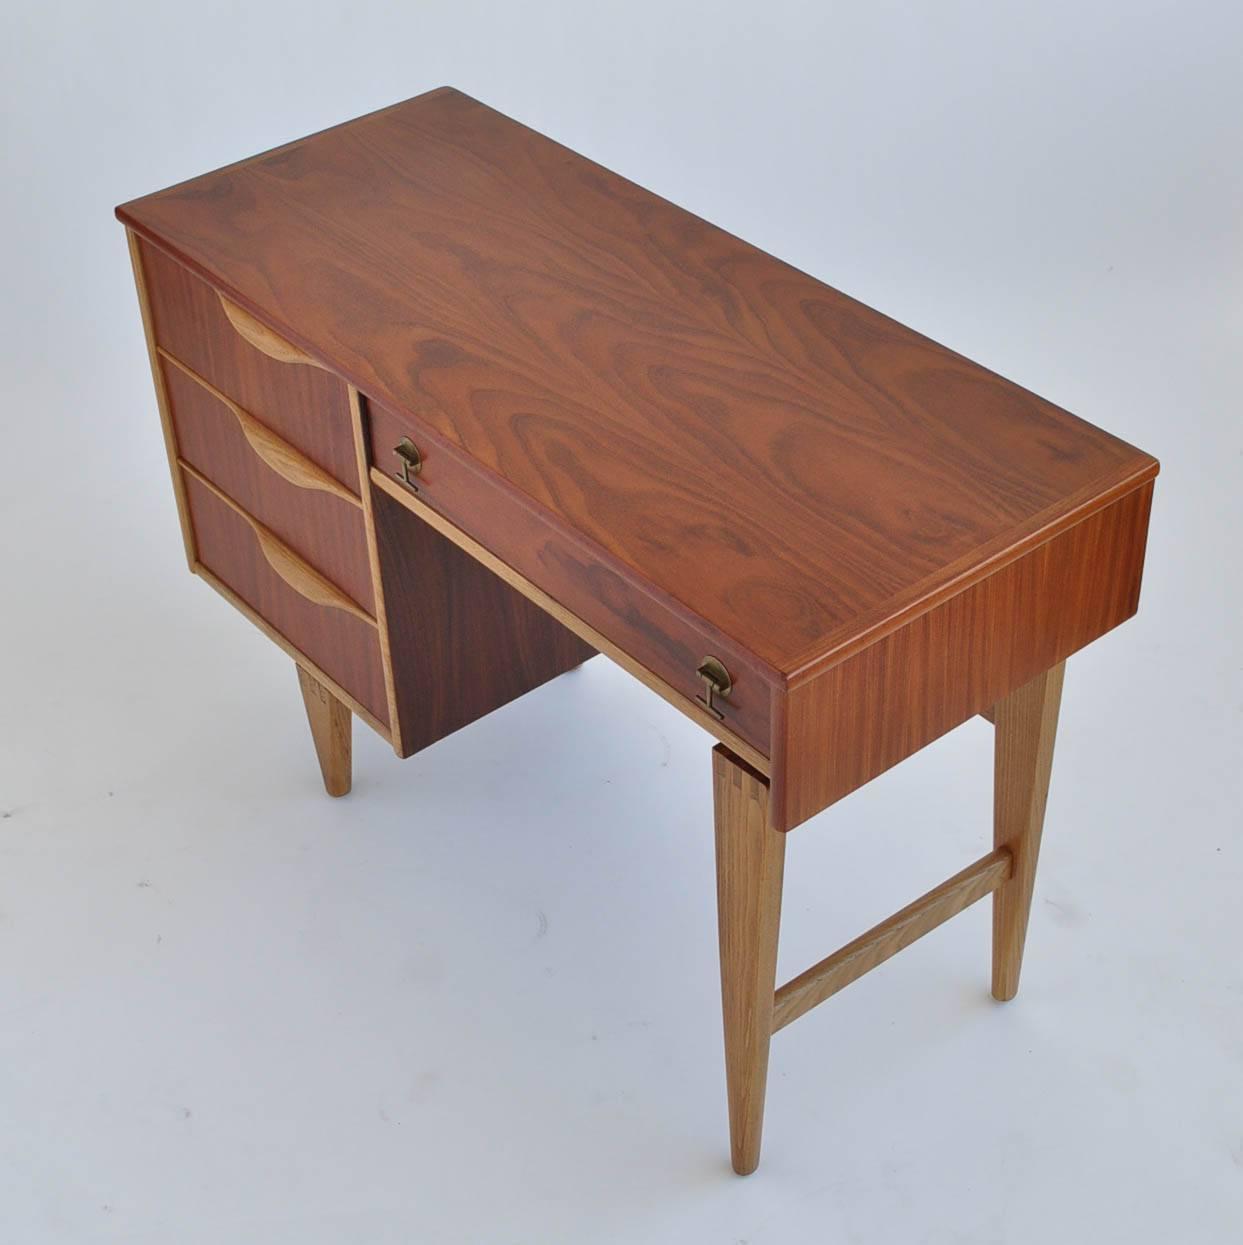 Los Angeles Period Furniture Company Ideas